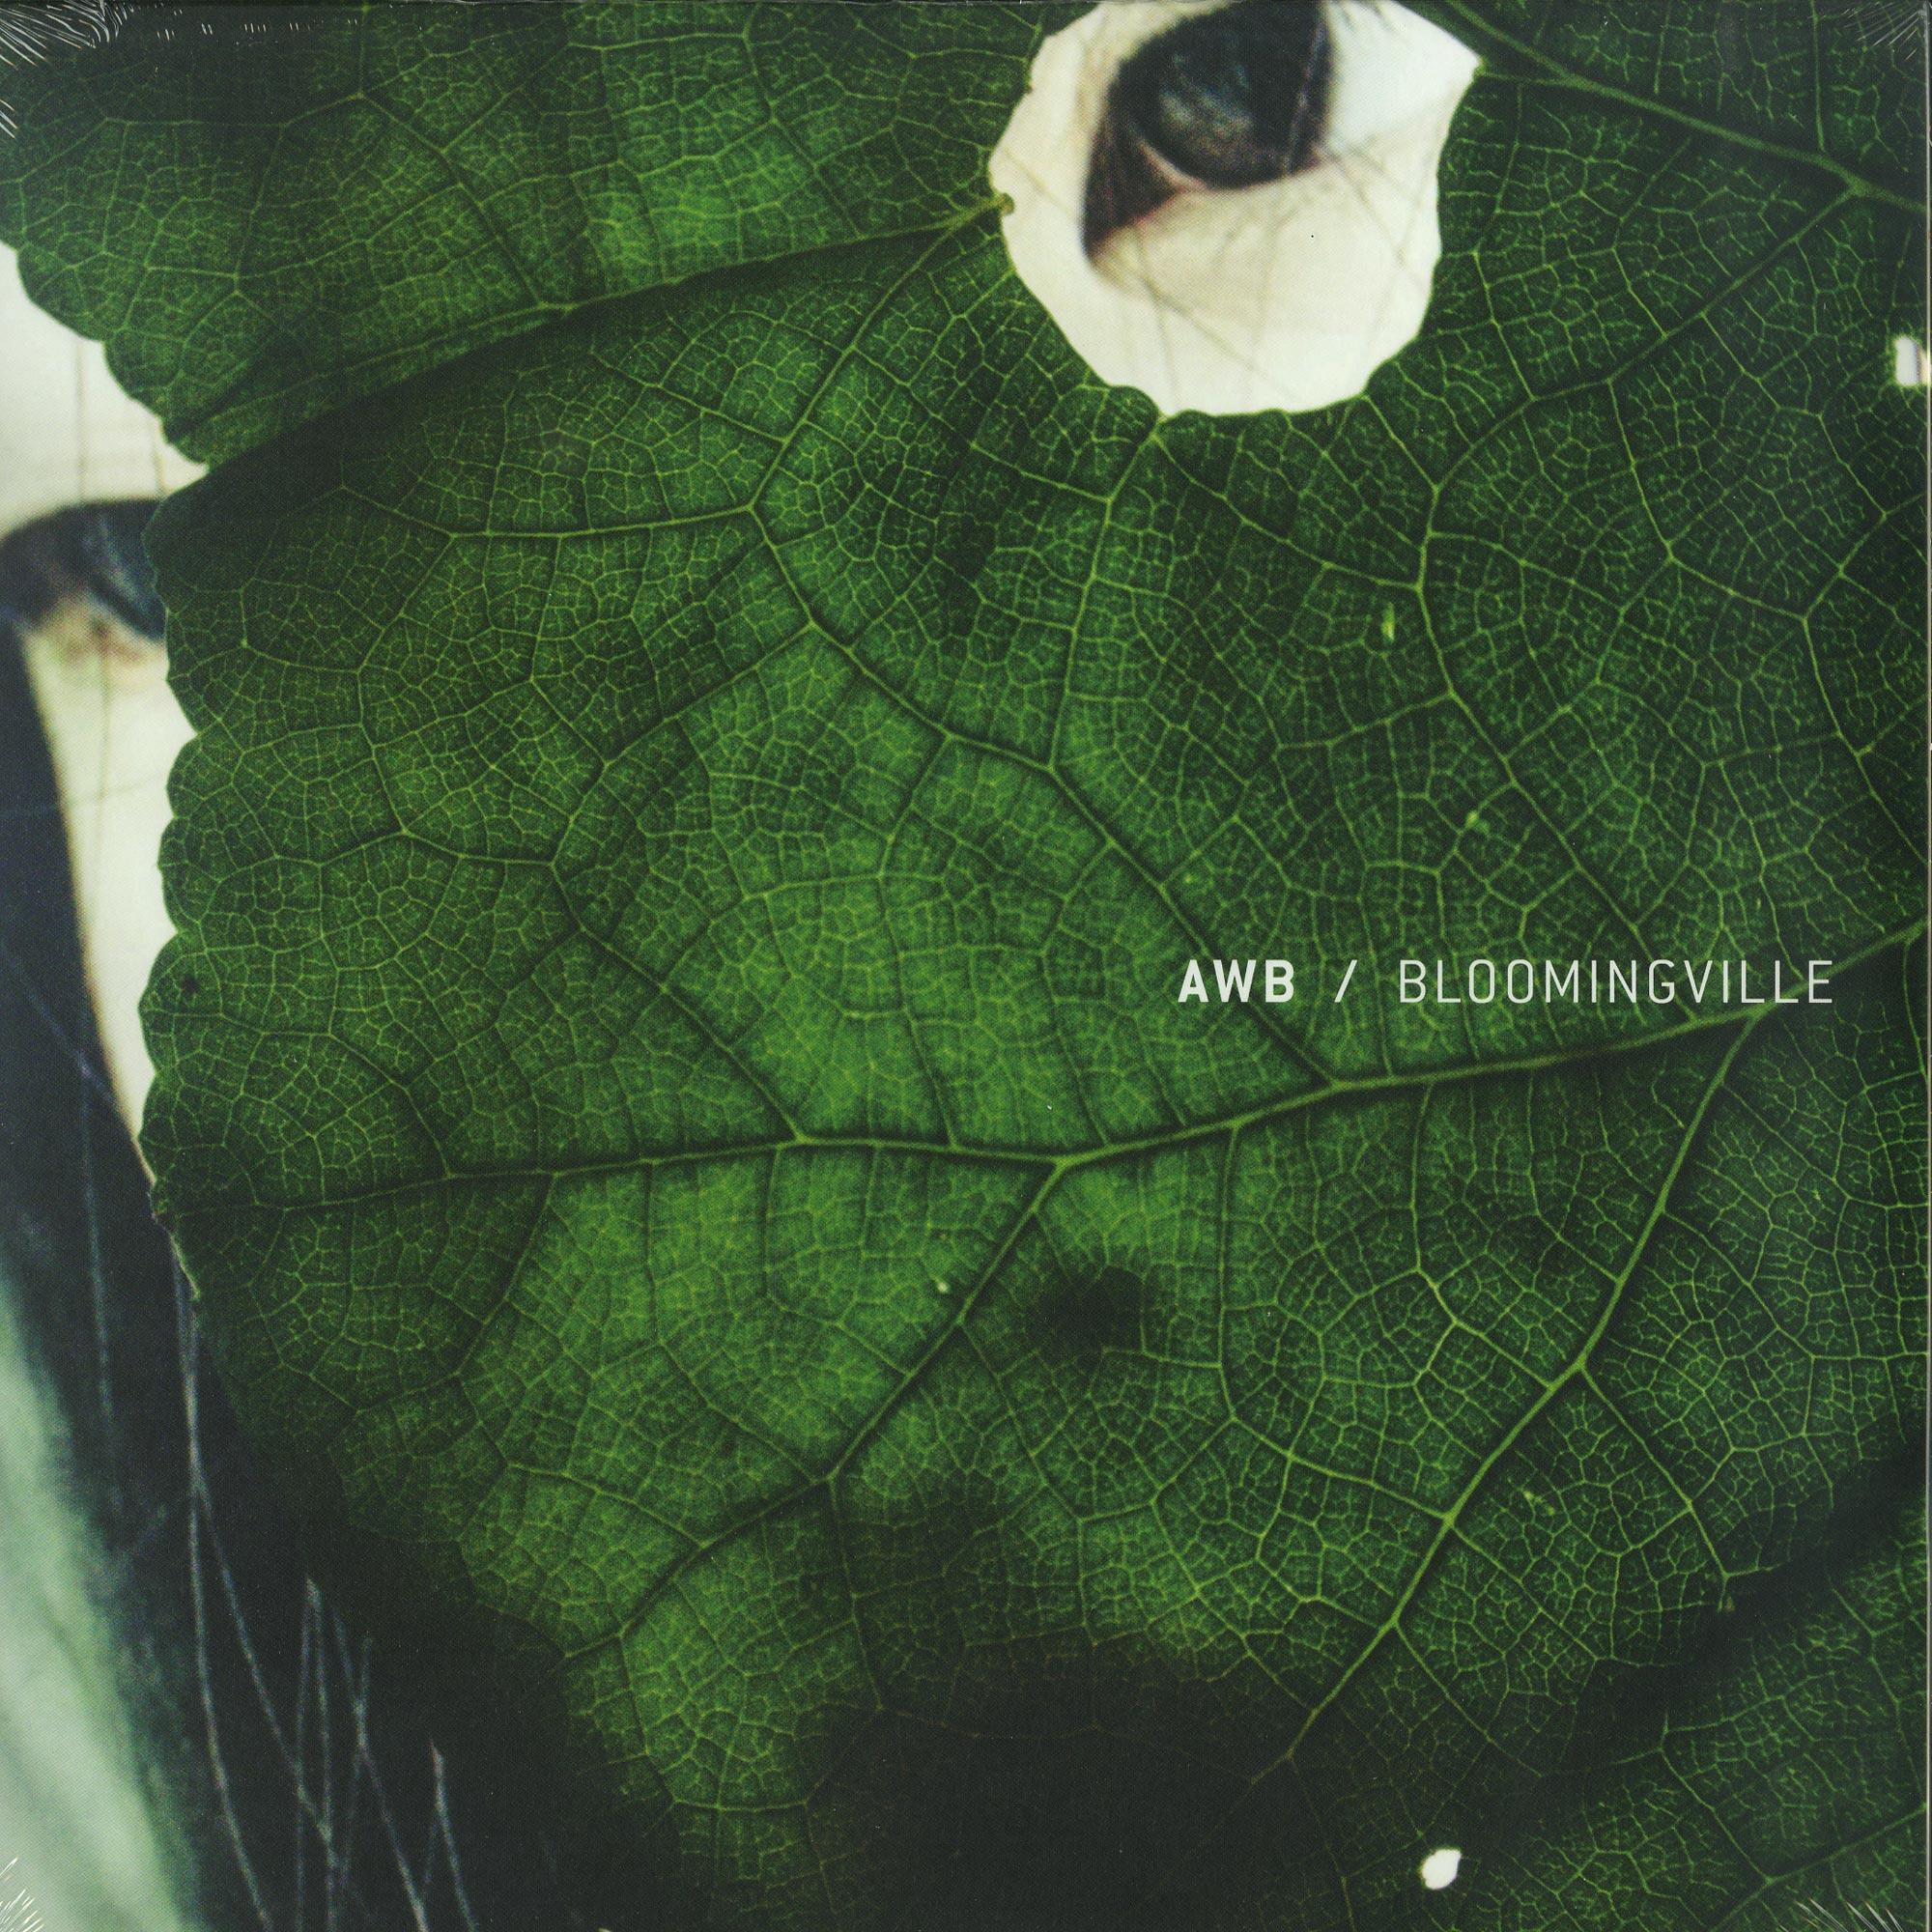 AWB - BLOOMINGVILLE